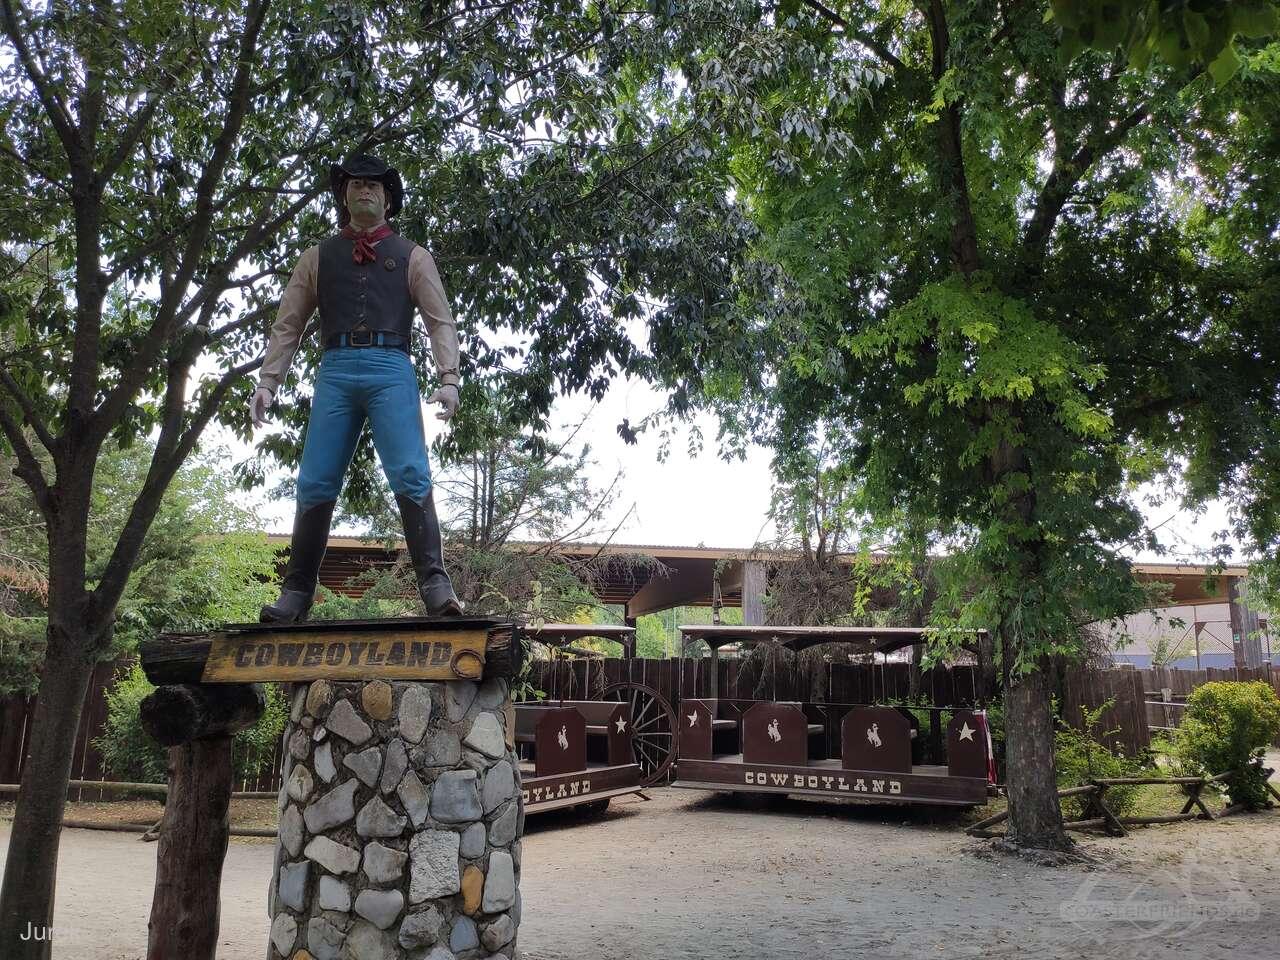 Cowboyland Impressionen